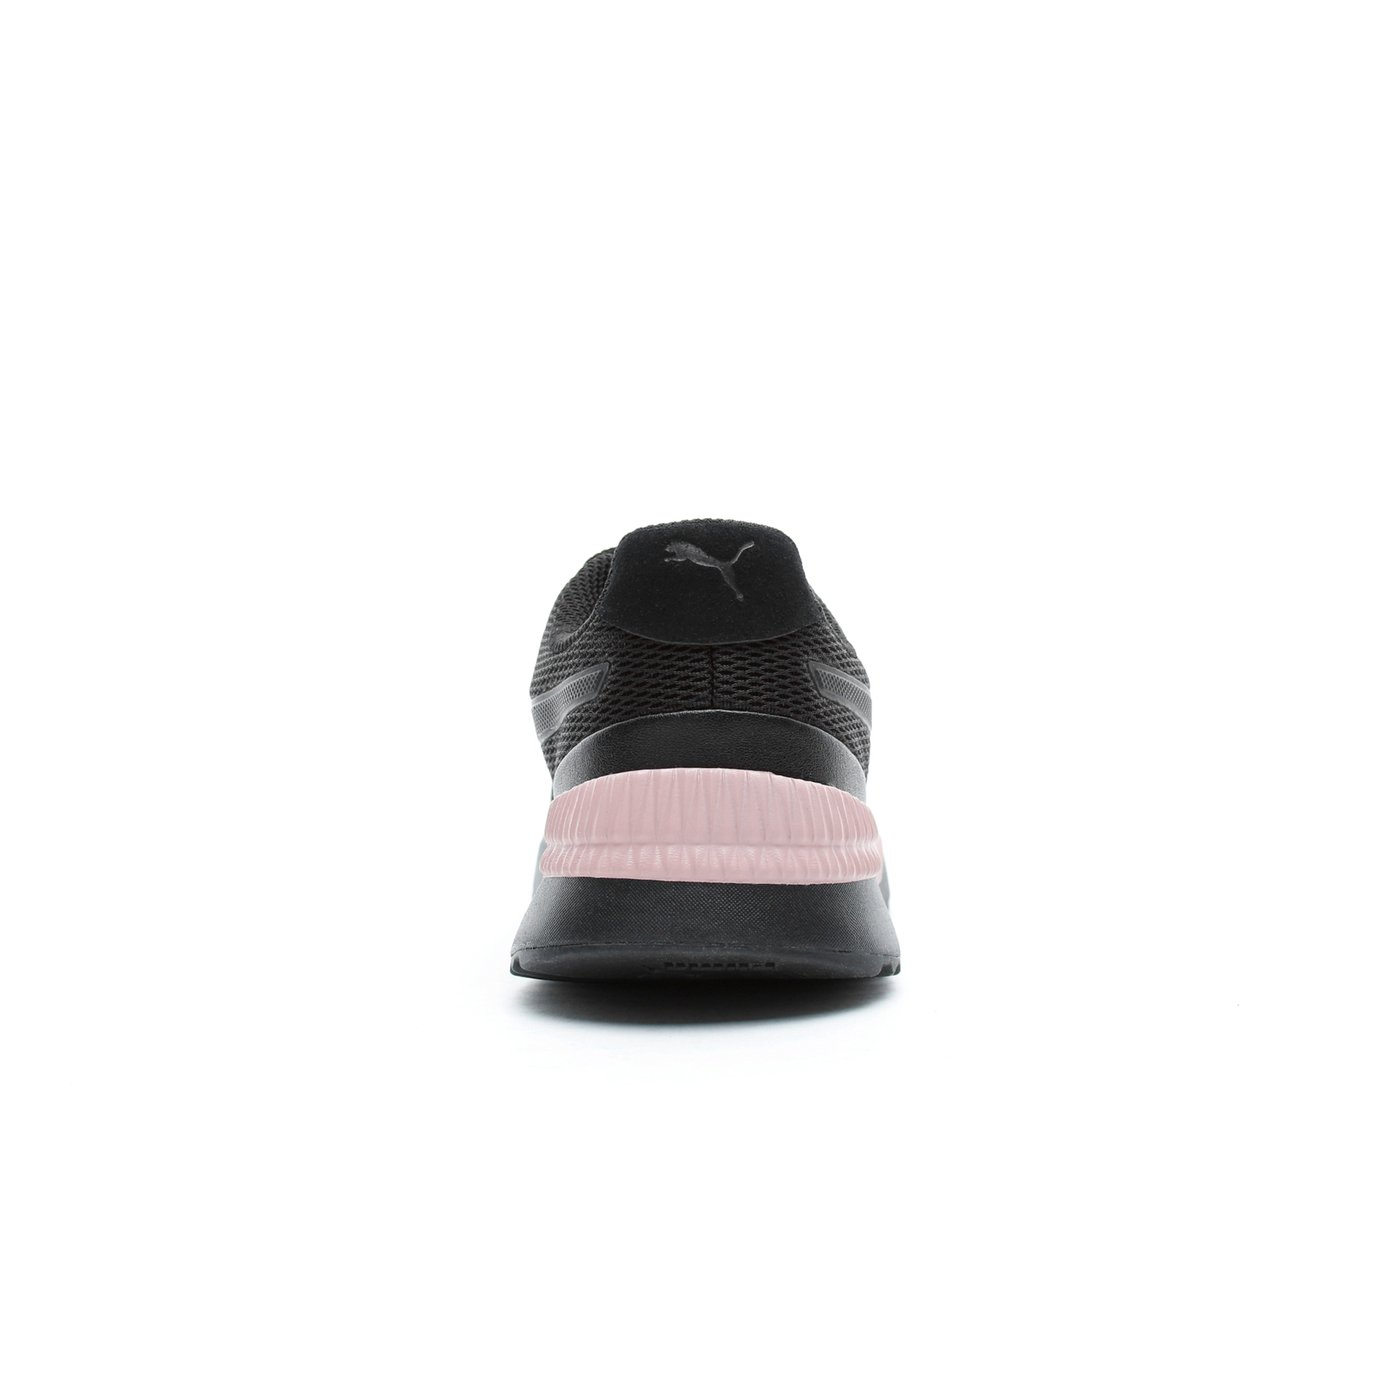 Puma Pacer Next Fs Kadın Siyah Spor Ayakkabı